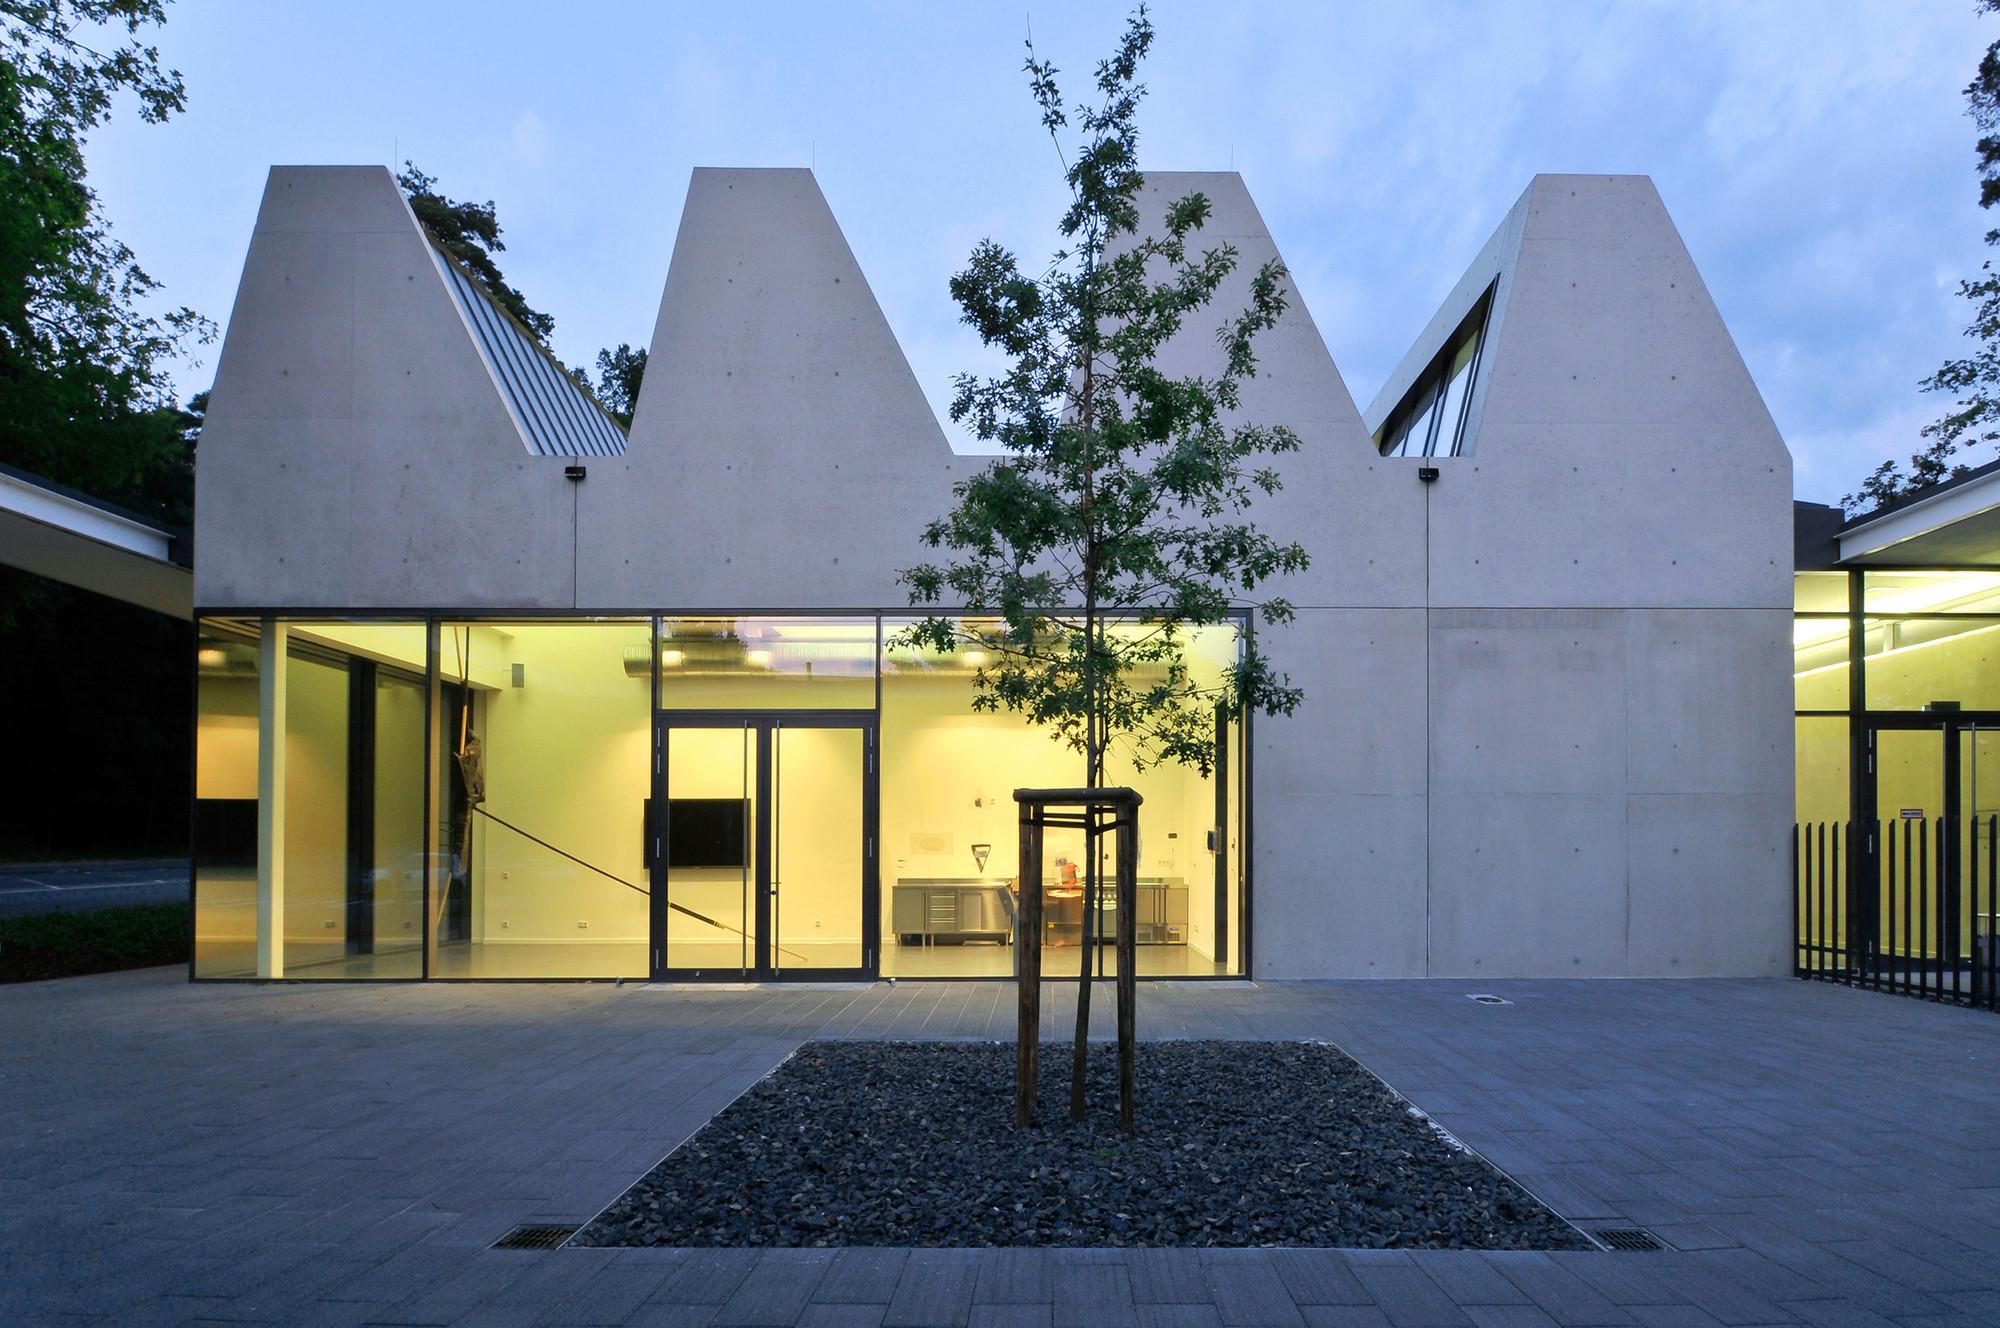 Extension to the Academy of Fine Arts / Hascher Jehle Architektur, © Svenja Bockhop